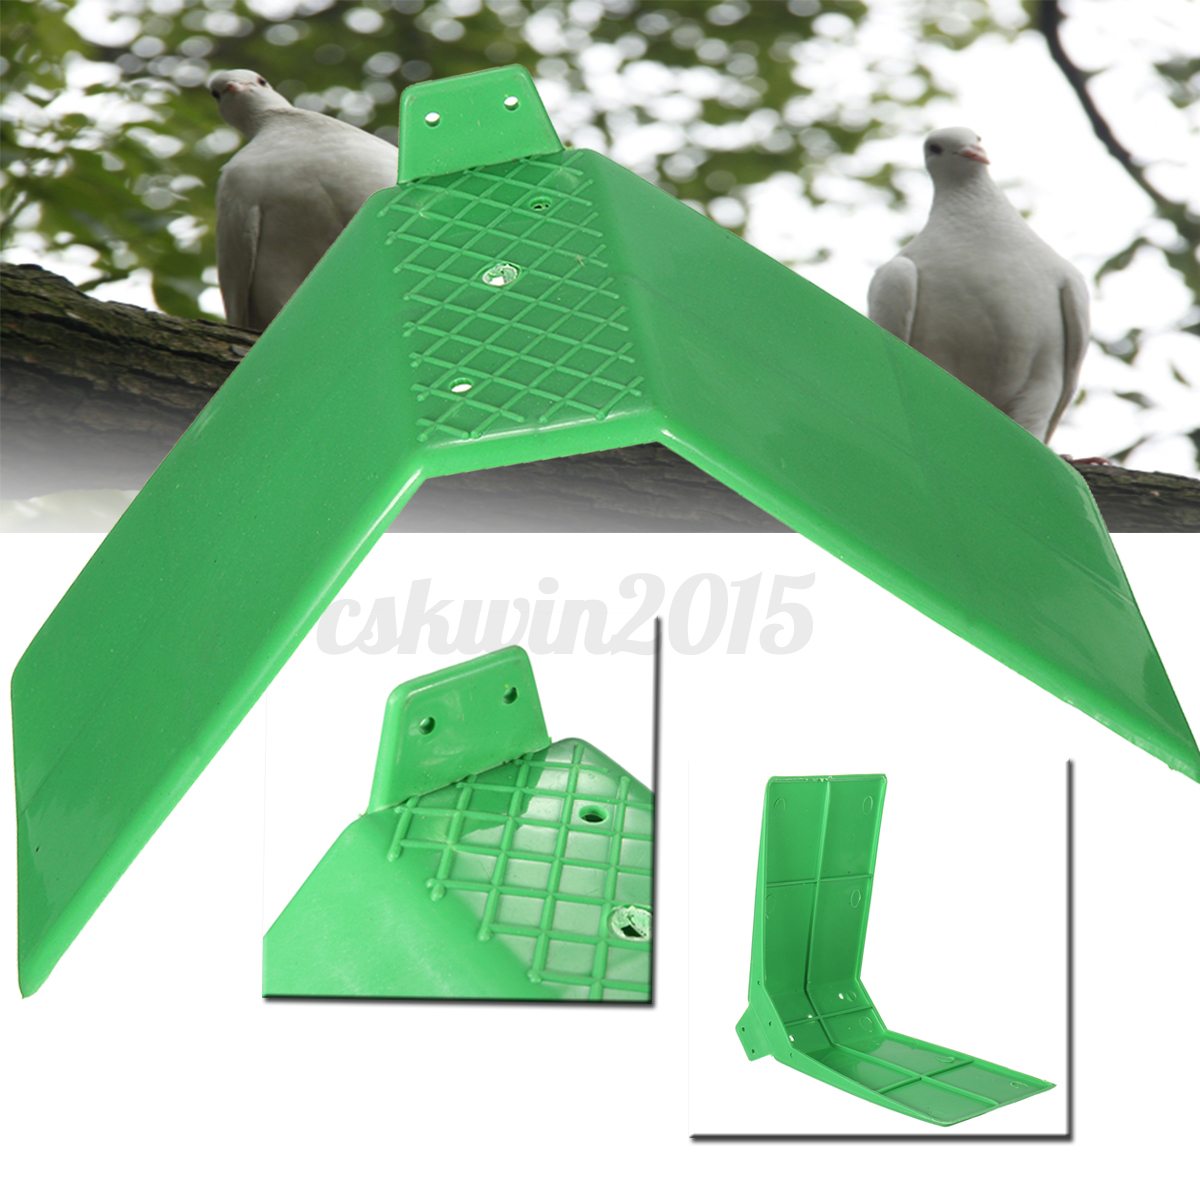 2pcs 30x26cm Wires Bars Frame Racing Pigeon Entrance Fantail Tumbler Source · Detail Image